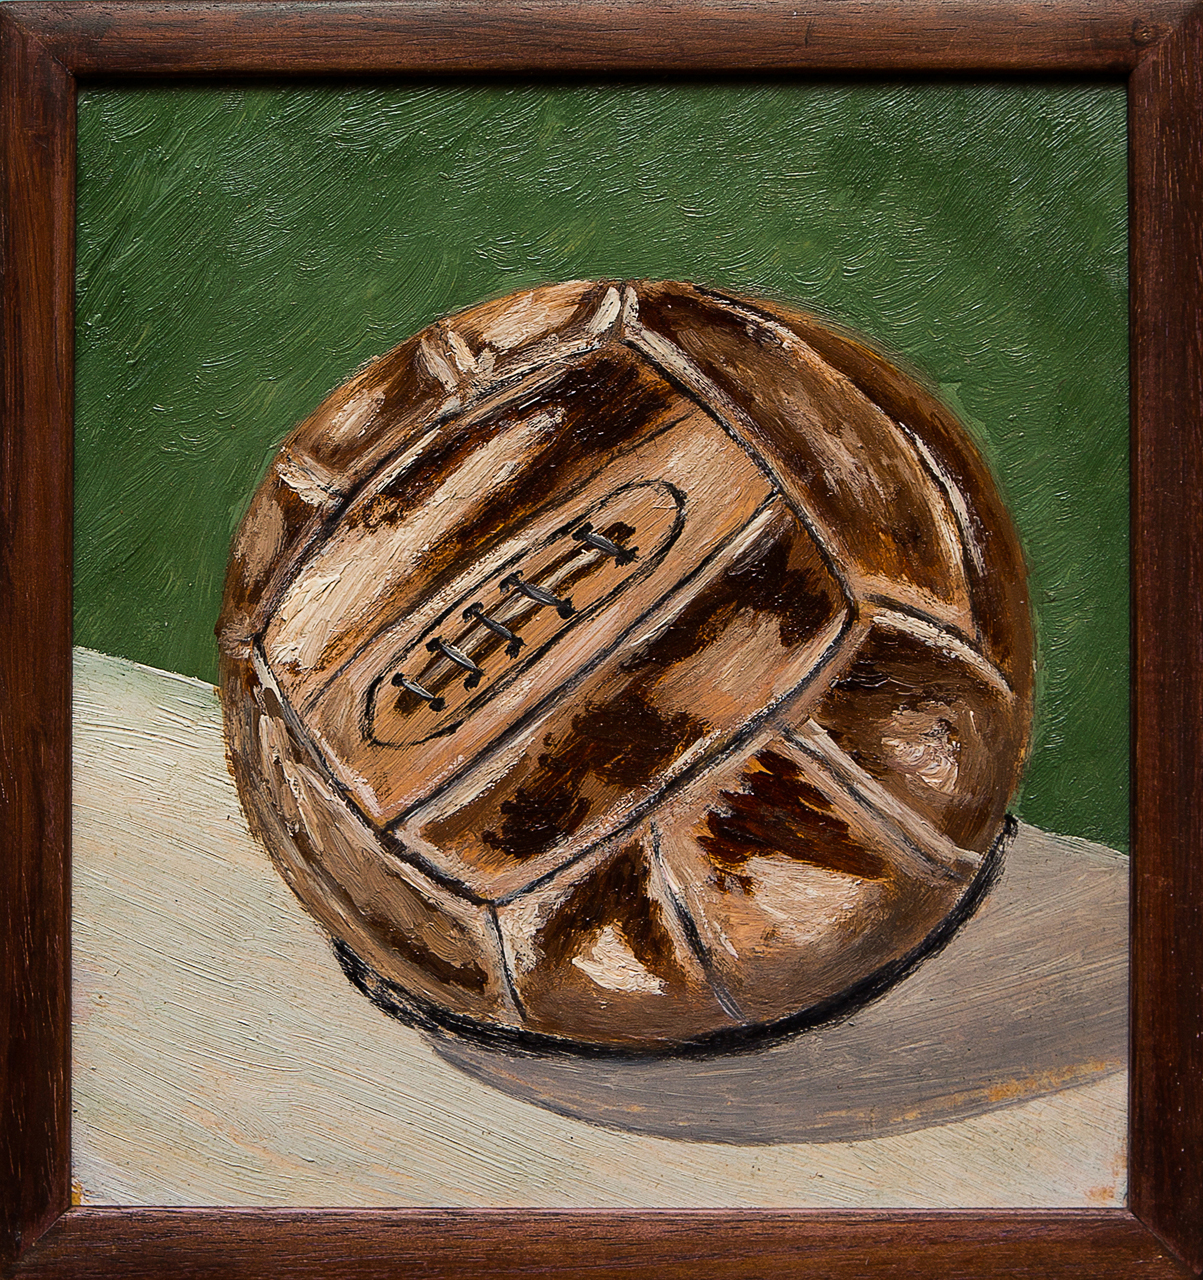 Картина маслом Мяч юности. 1967 год Мифтахов картина маслом подсолнухи мифтахов